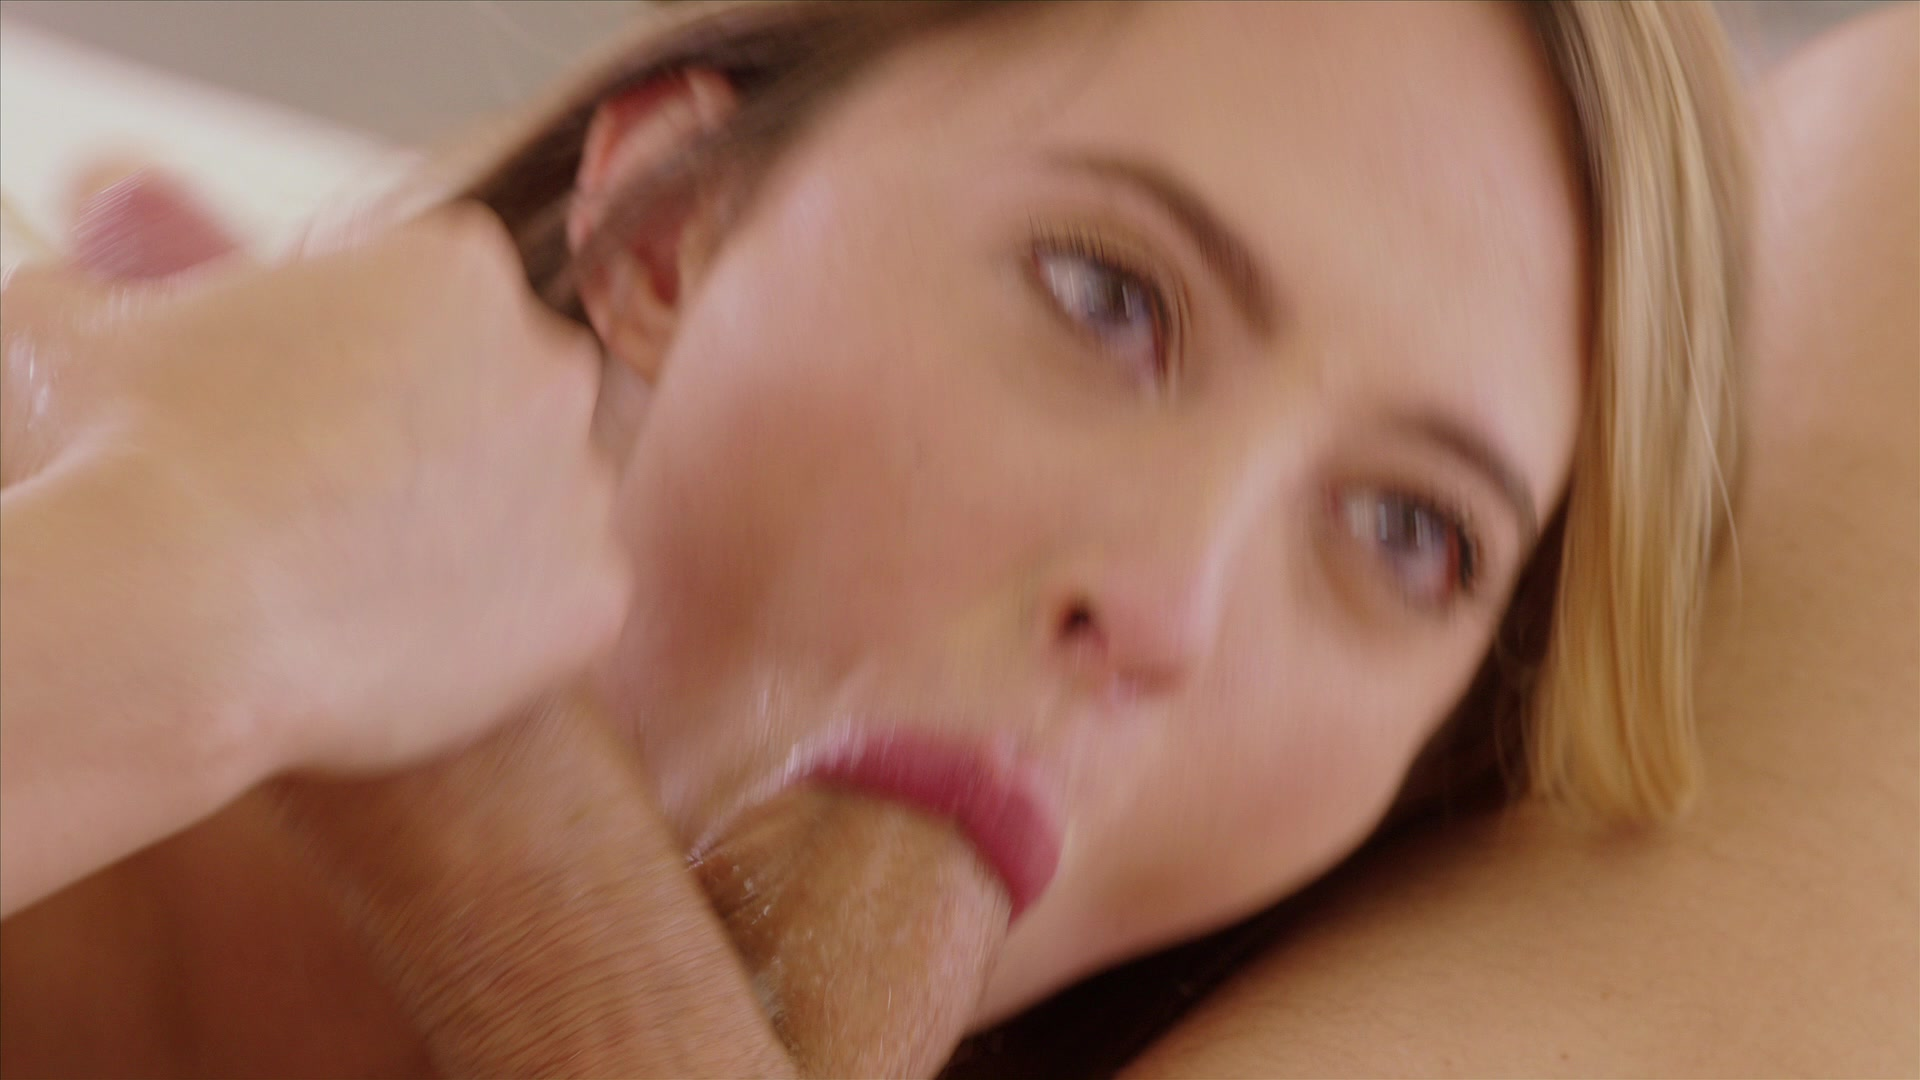 Tushy kelsi monroe passionate anal sex 6